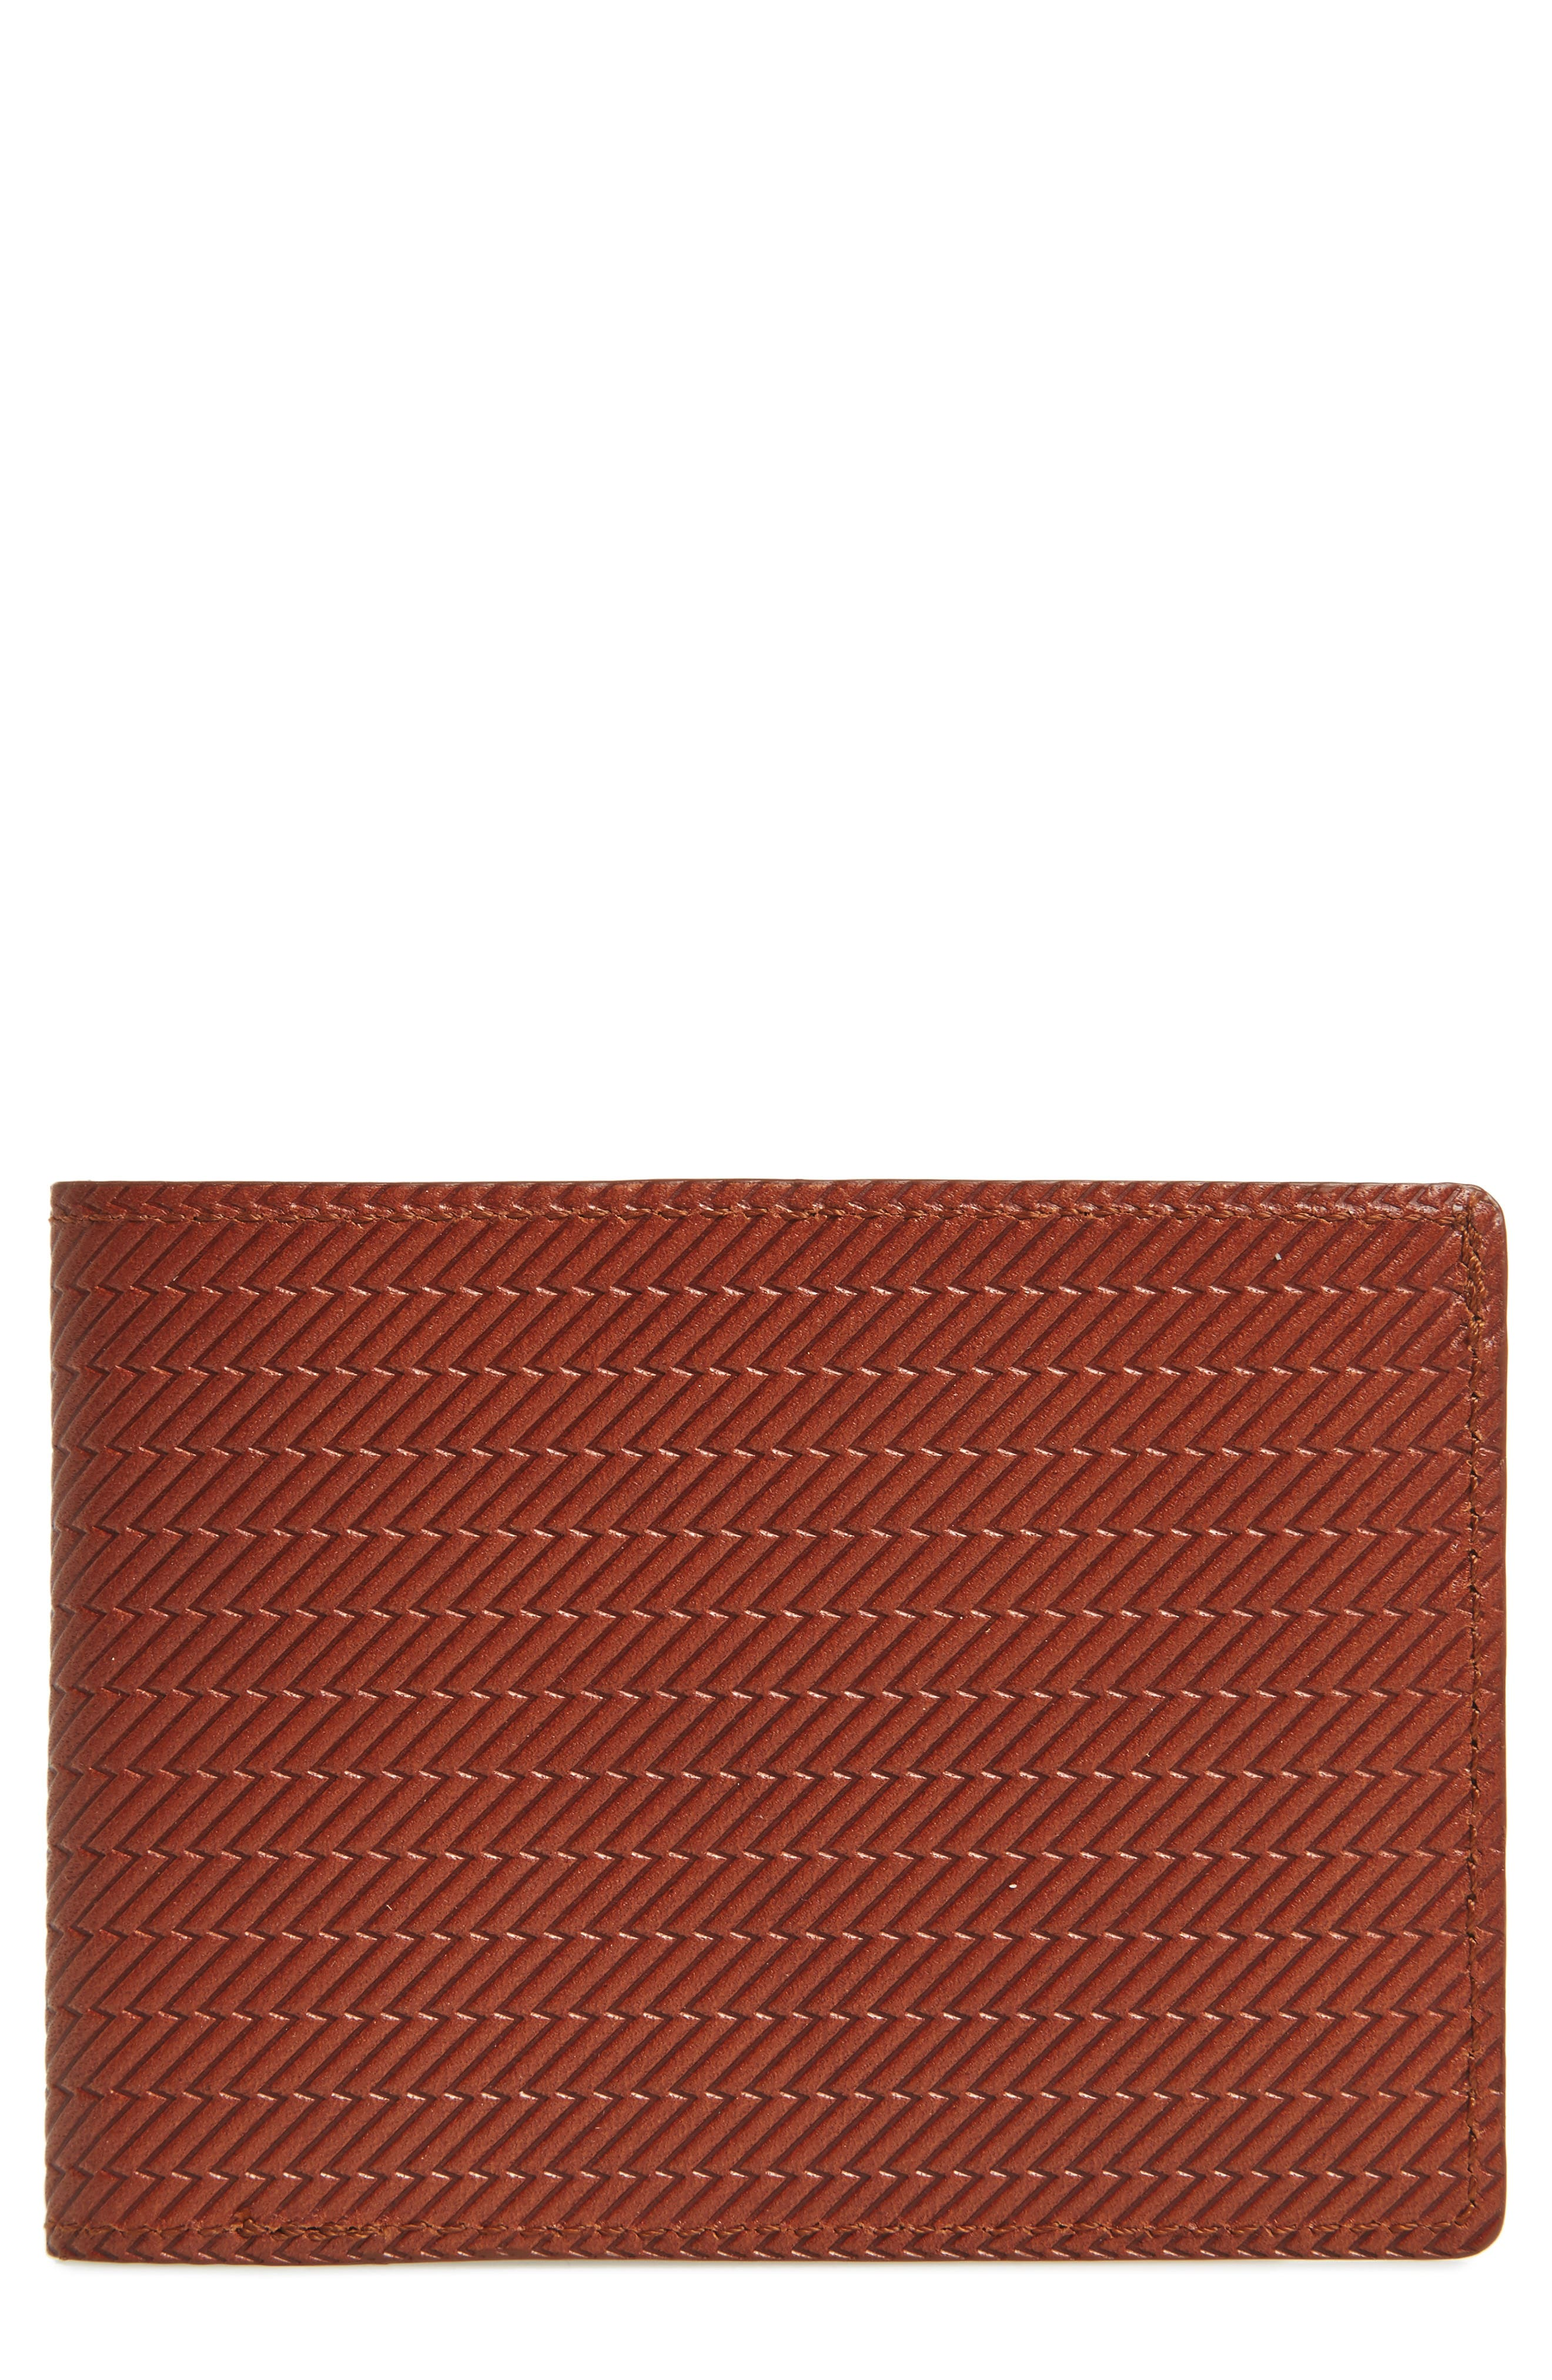 SHINOLA Leather Wallet